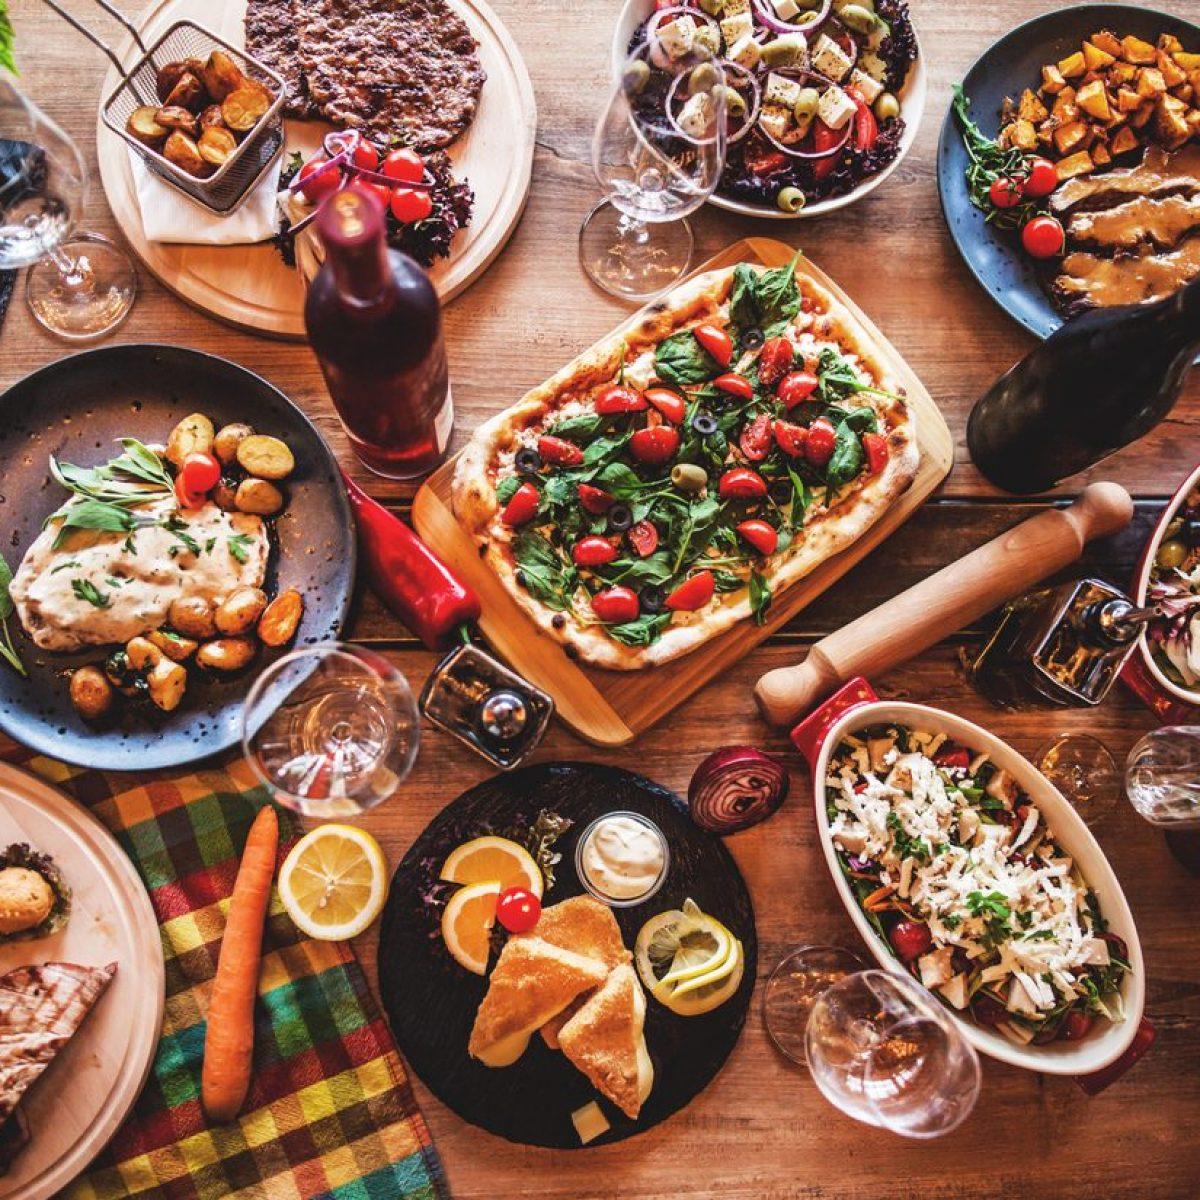 Antipasti Per Buffet Di Natale.15 Antipasti Freddi Per Buffet Le Ricette Piu Sfiziose